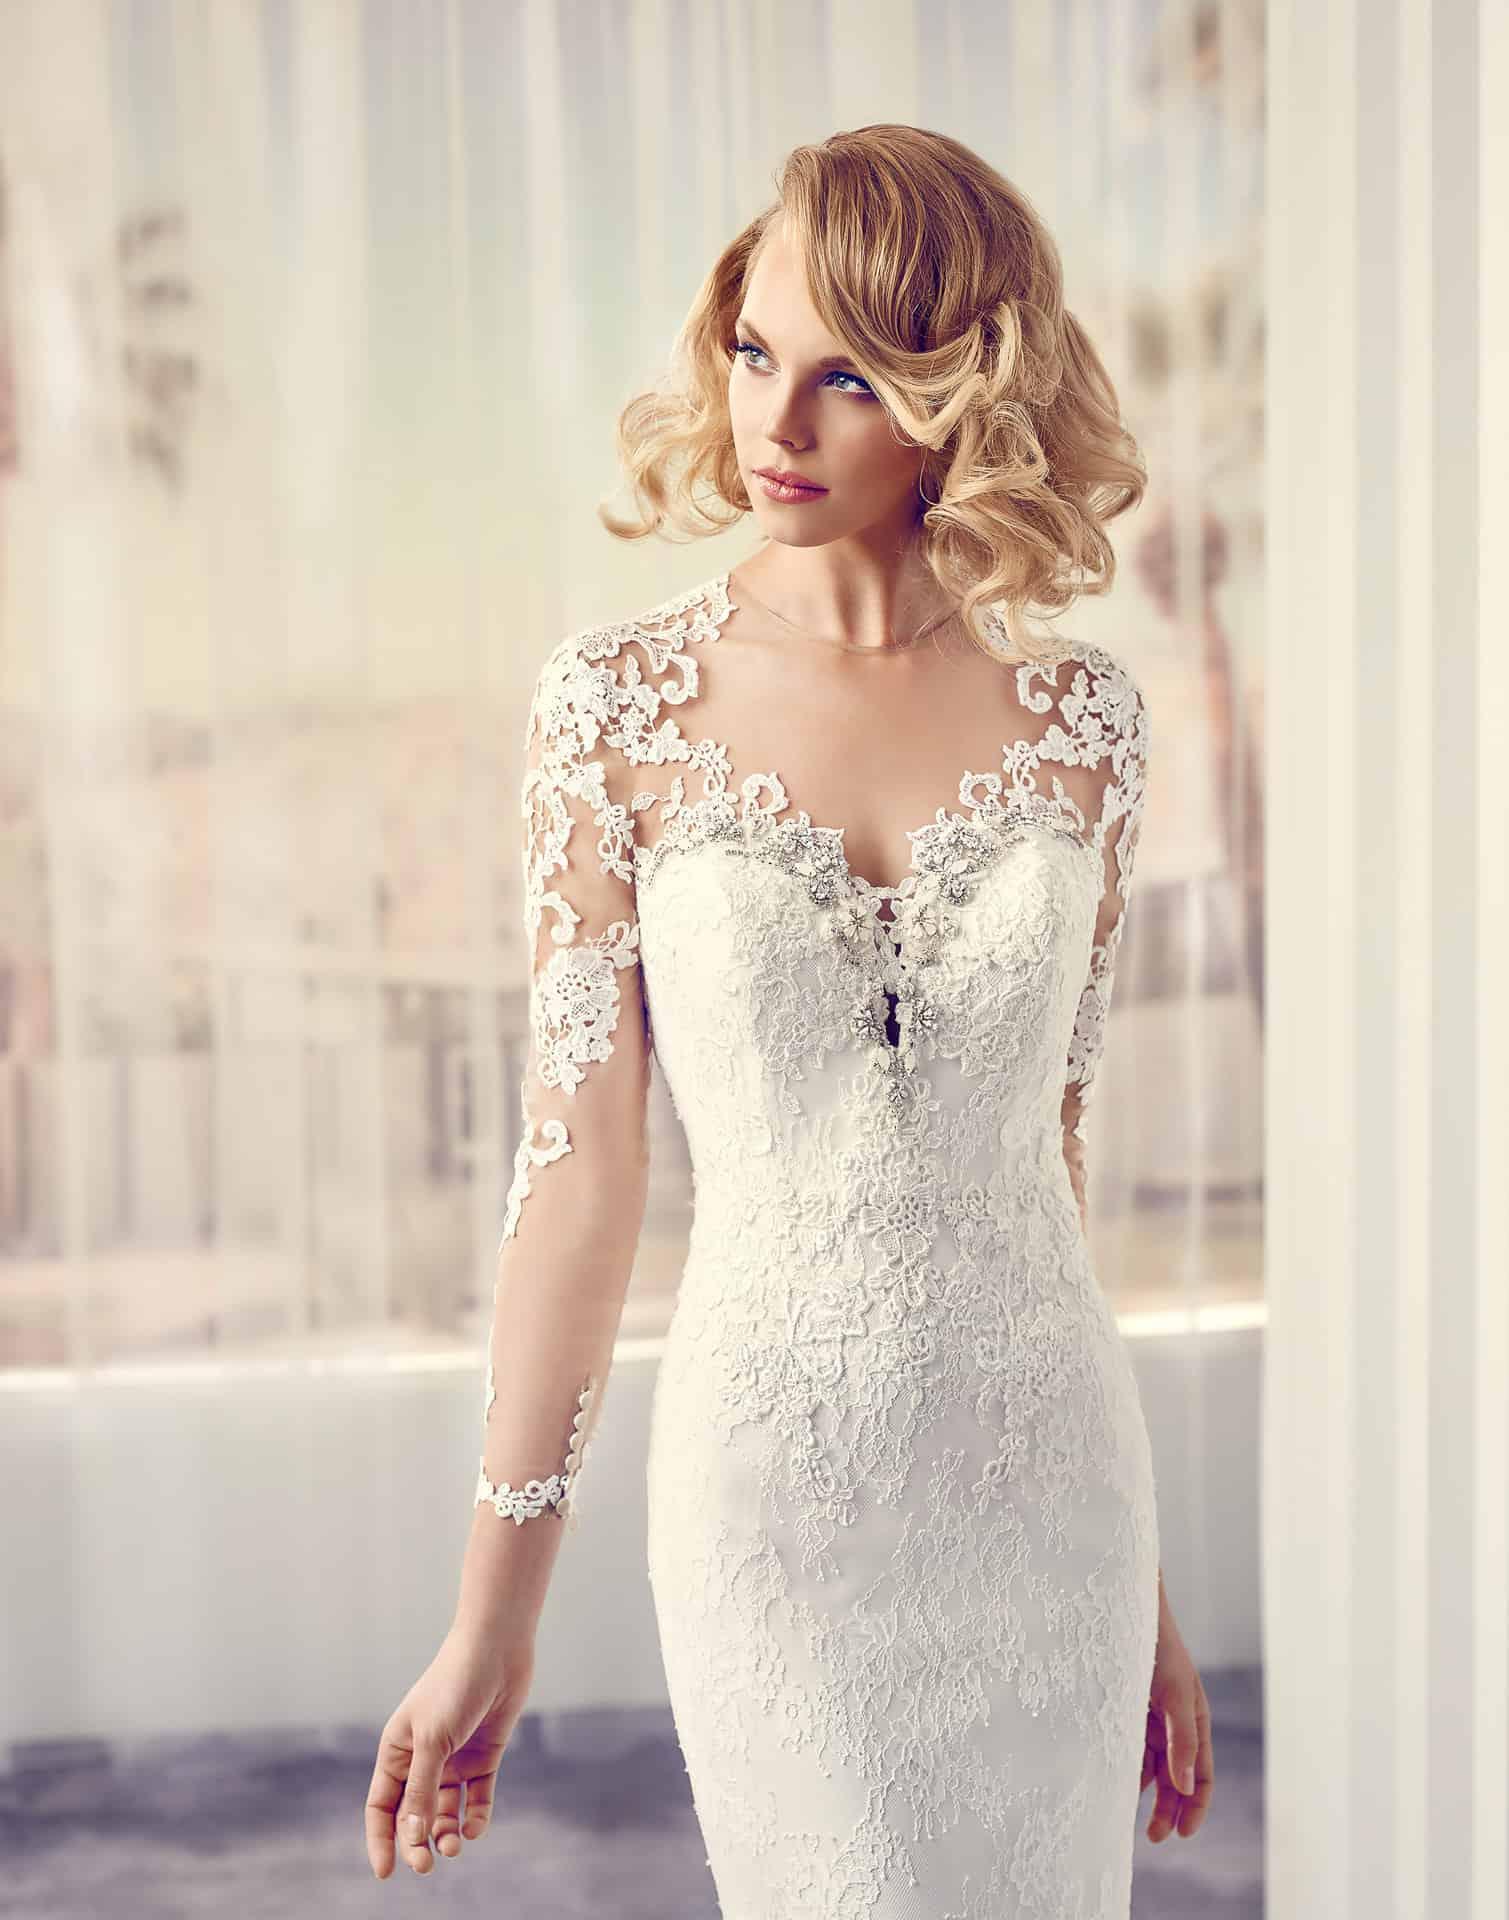 Wedding Dresses Gallery 27